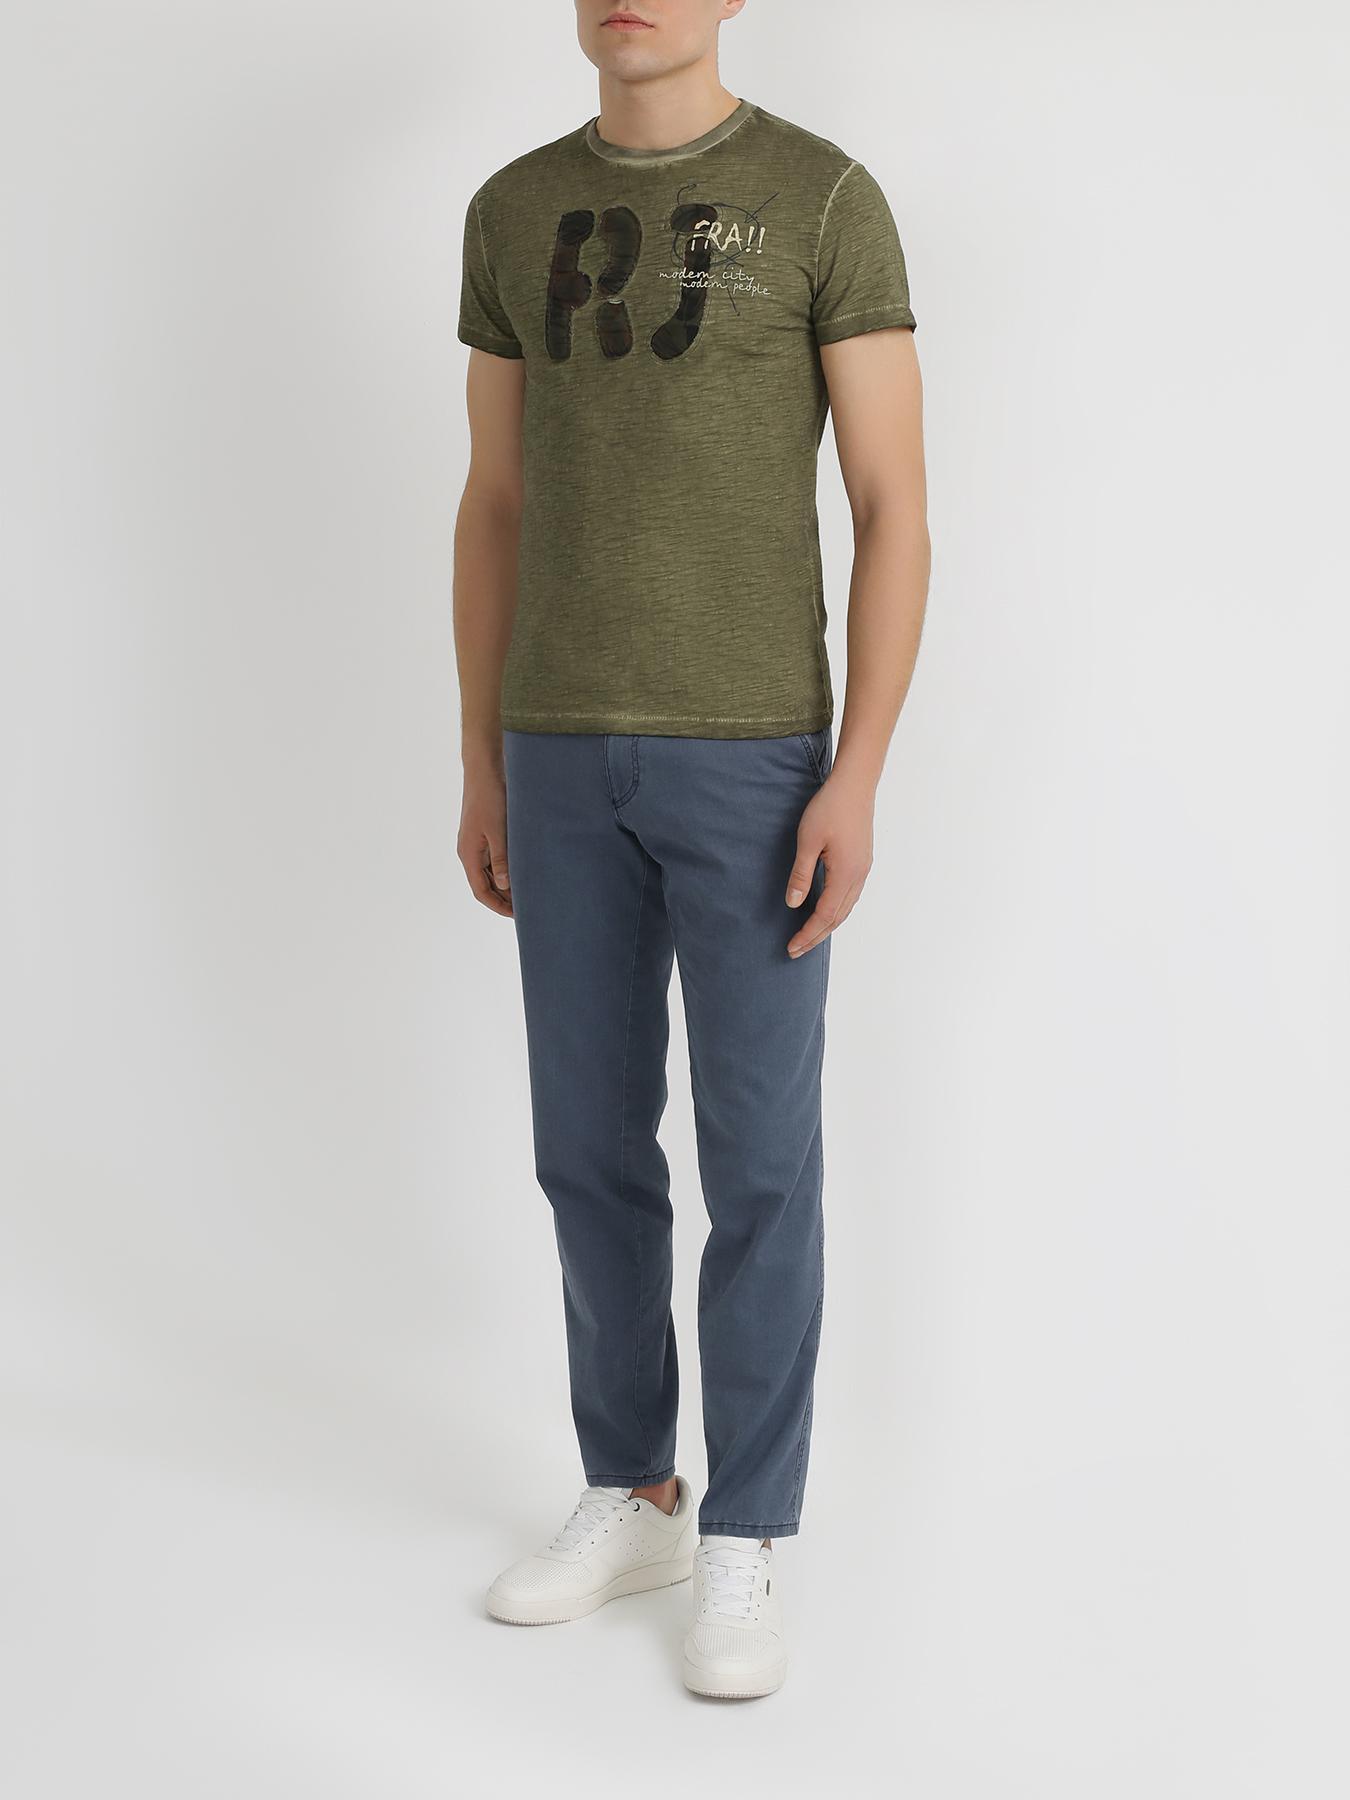 Фуфайка Ritter Jeans Хлопковая футболка brioni хлопковая футболка